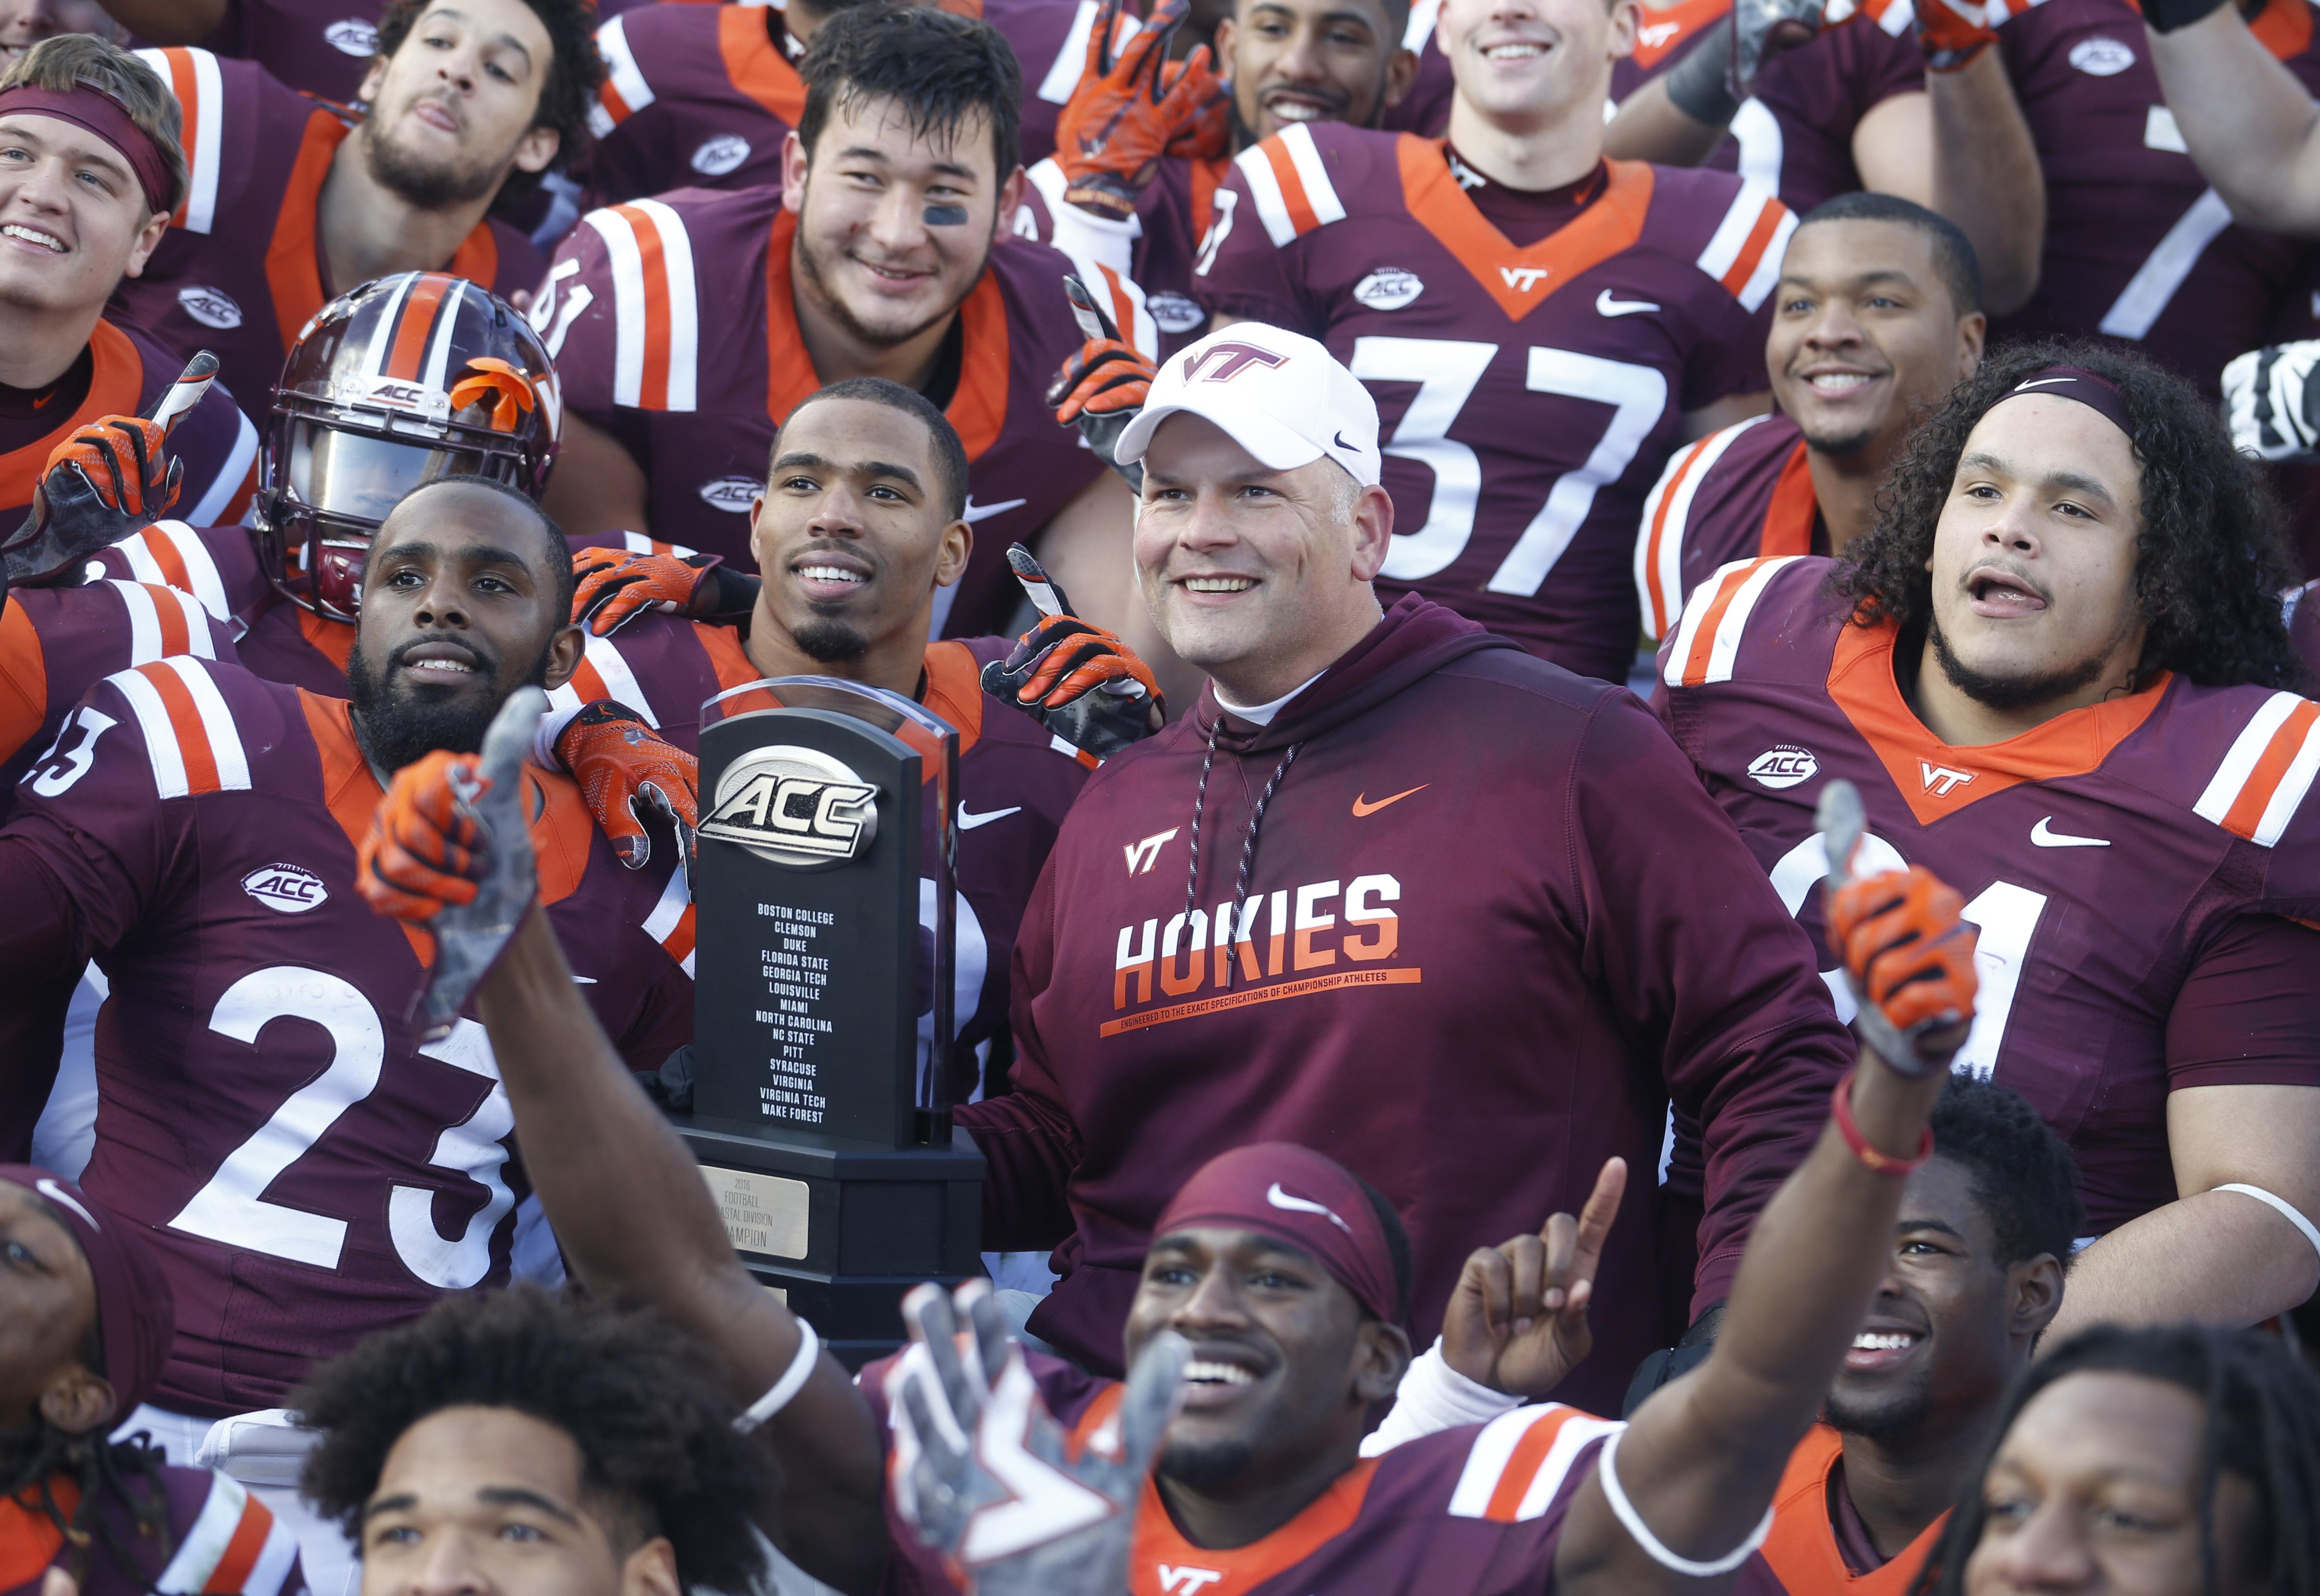 Virginia Tech head coach Justin Fuente and his team celebrate their 52-10 win over Virginia after an NCAA college football game in Blacksburg, Va., Saturday, Nov. 26, 2016. (AP Photo/Steve Helber)